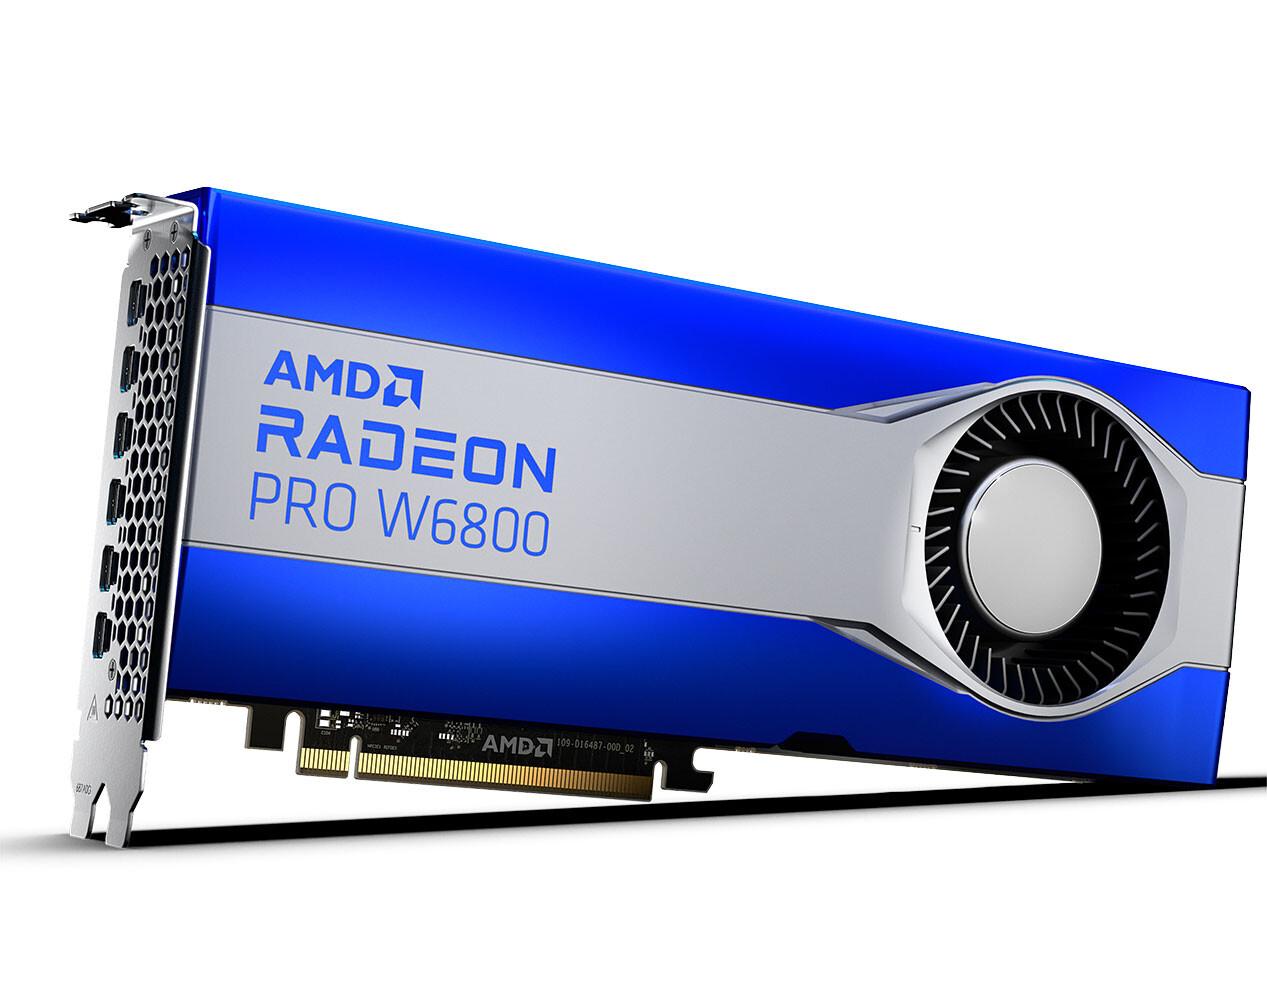 Radeon_Pro_w6800_1.jpg